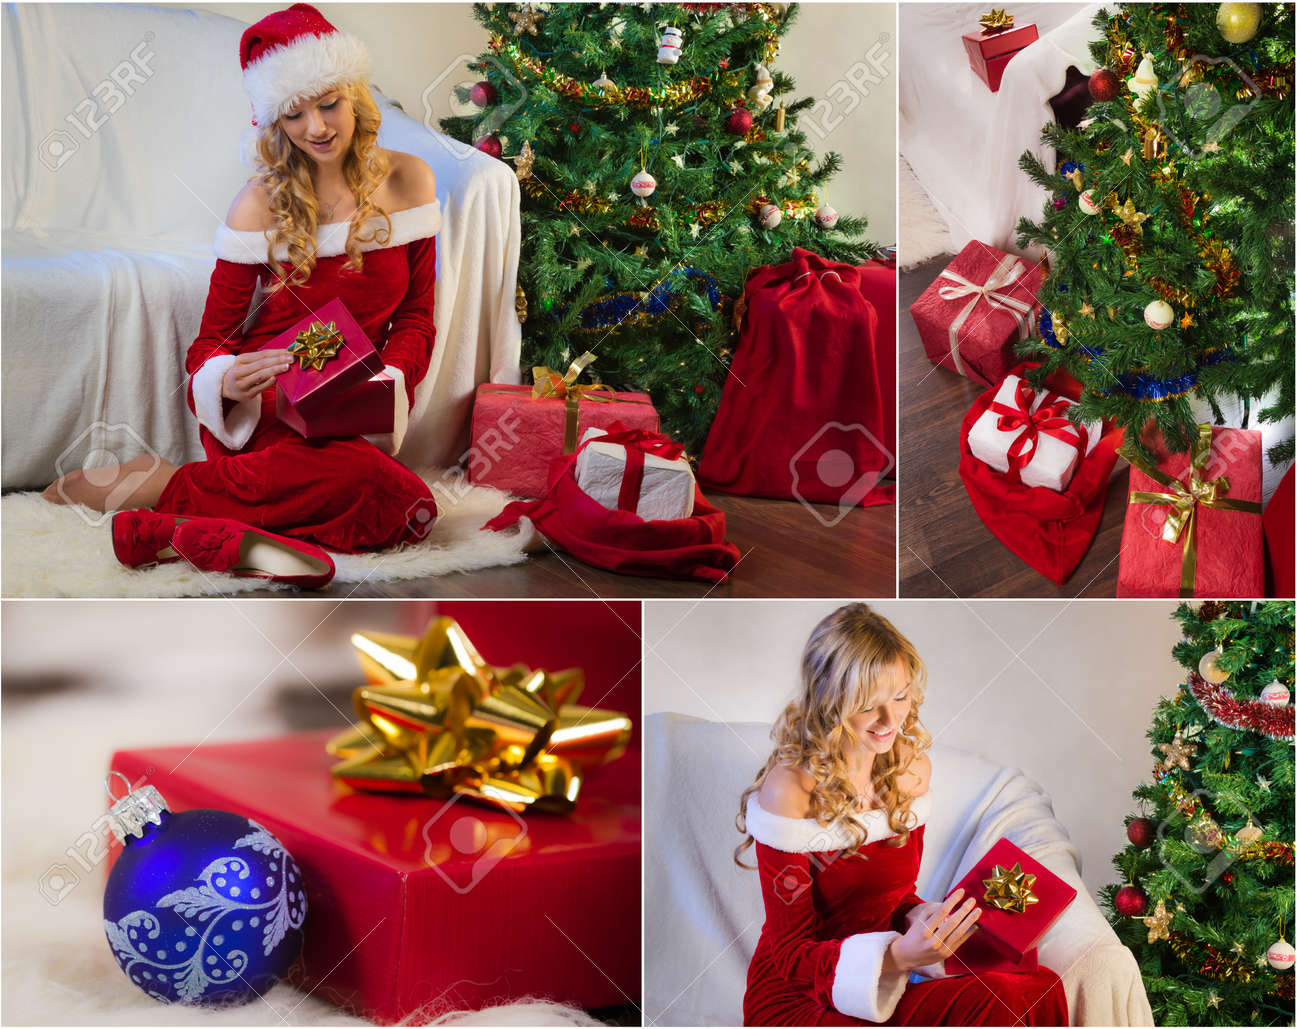 Postcard For Christmas With Christmas Tree And Gifts No. 5 Stock ...